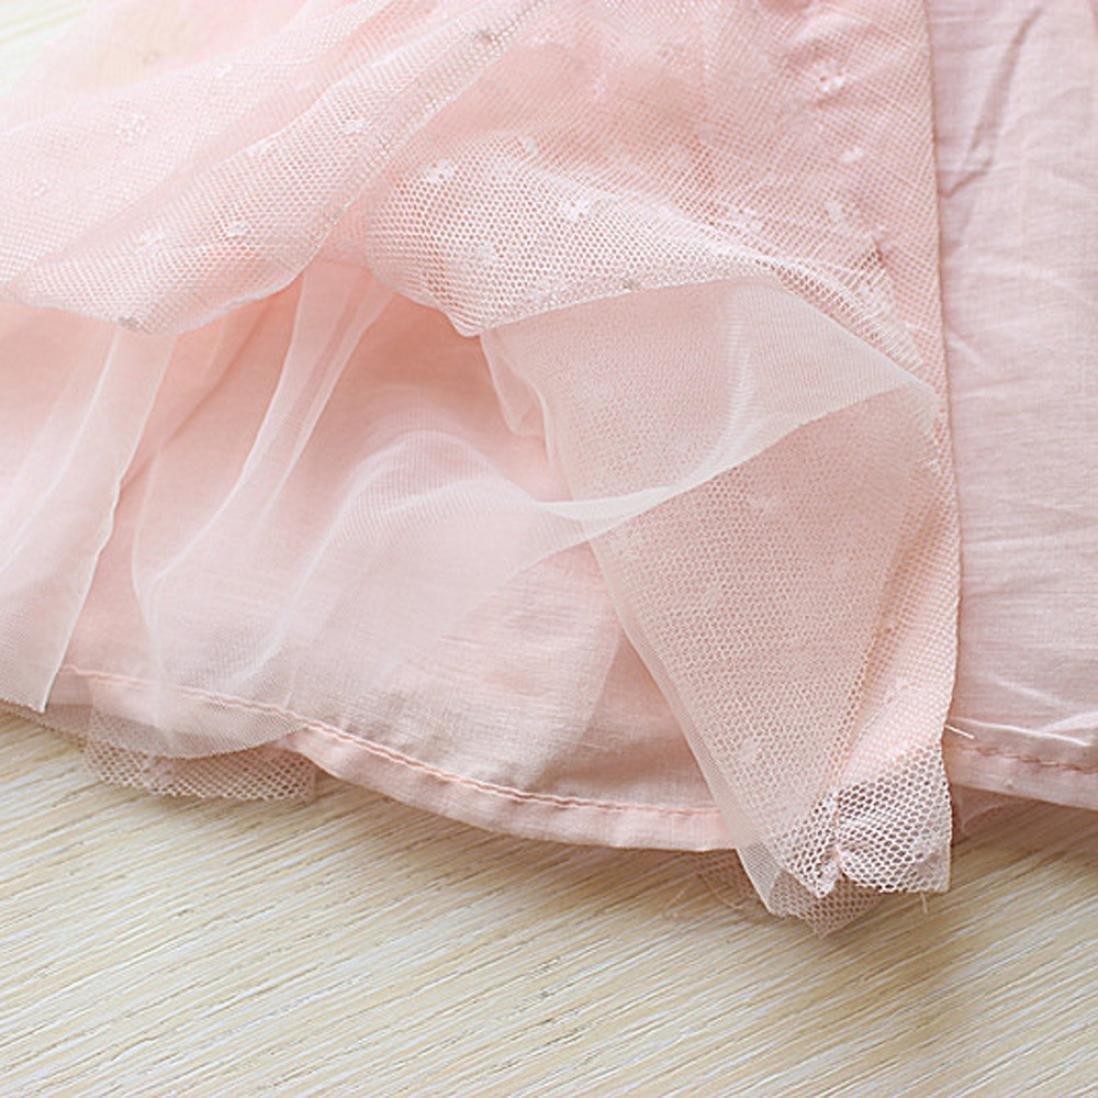 Fille Robe de Princesse Tutu Fil Dentelle Robe de Mariage de C/ér/émonie Mounter Robe B/éb/é